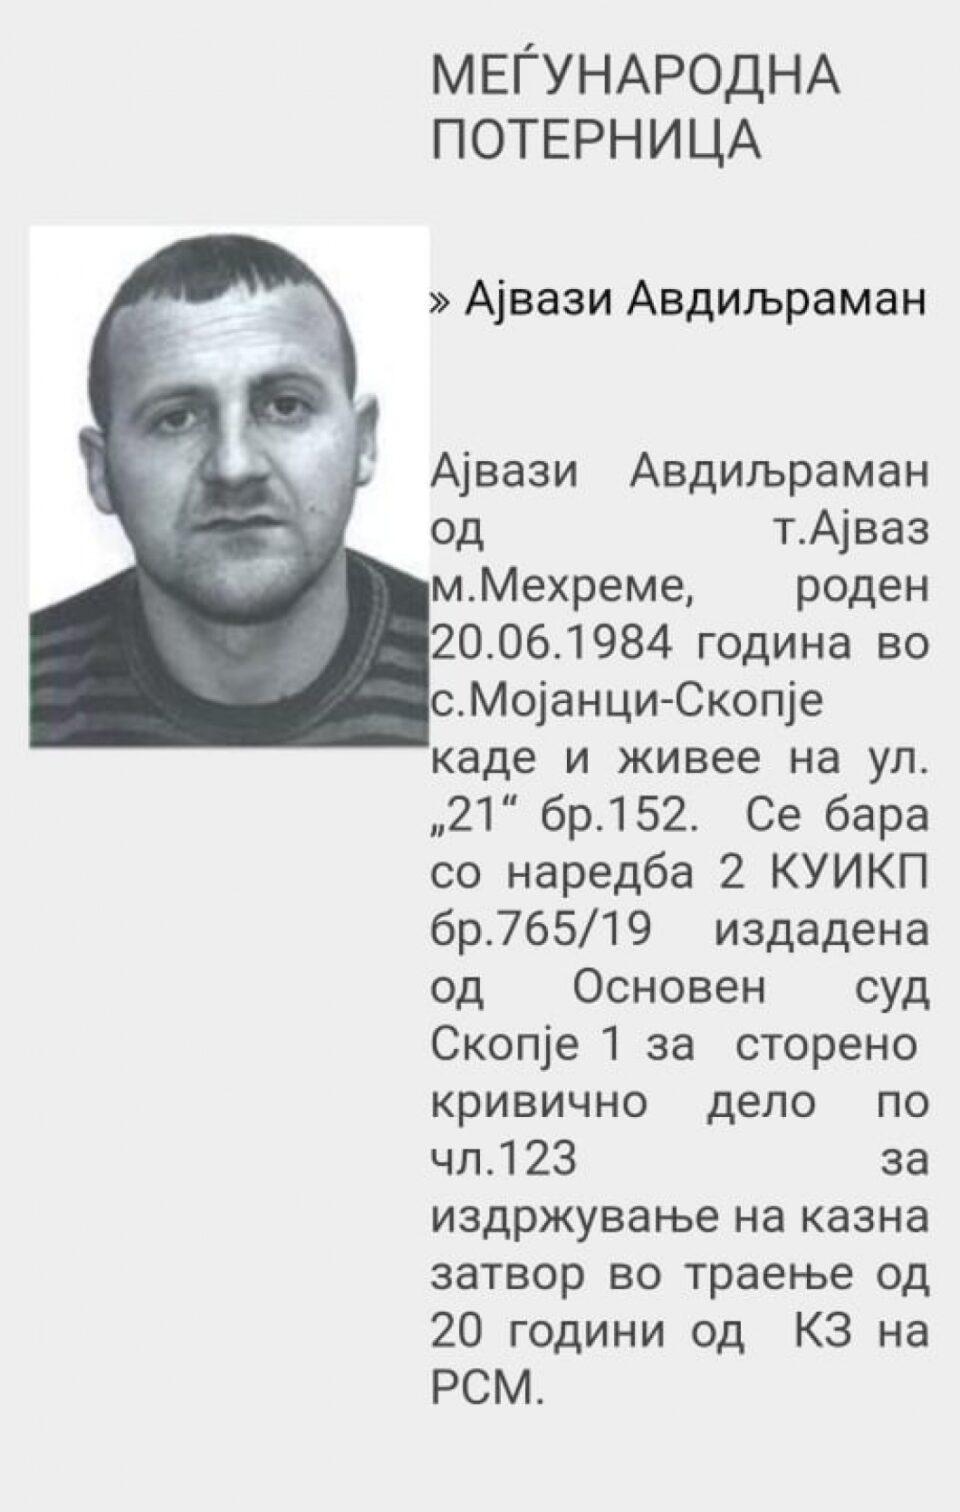 Фатен командант Тануша, бегалец осуден на 20 години затвор за убиство